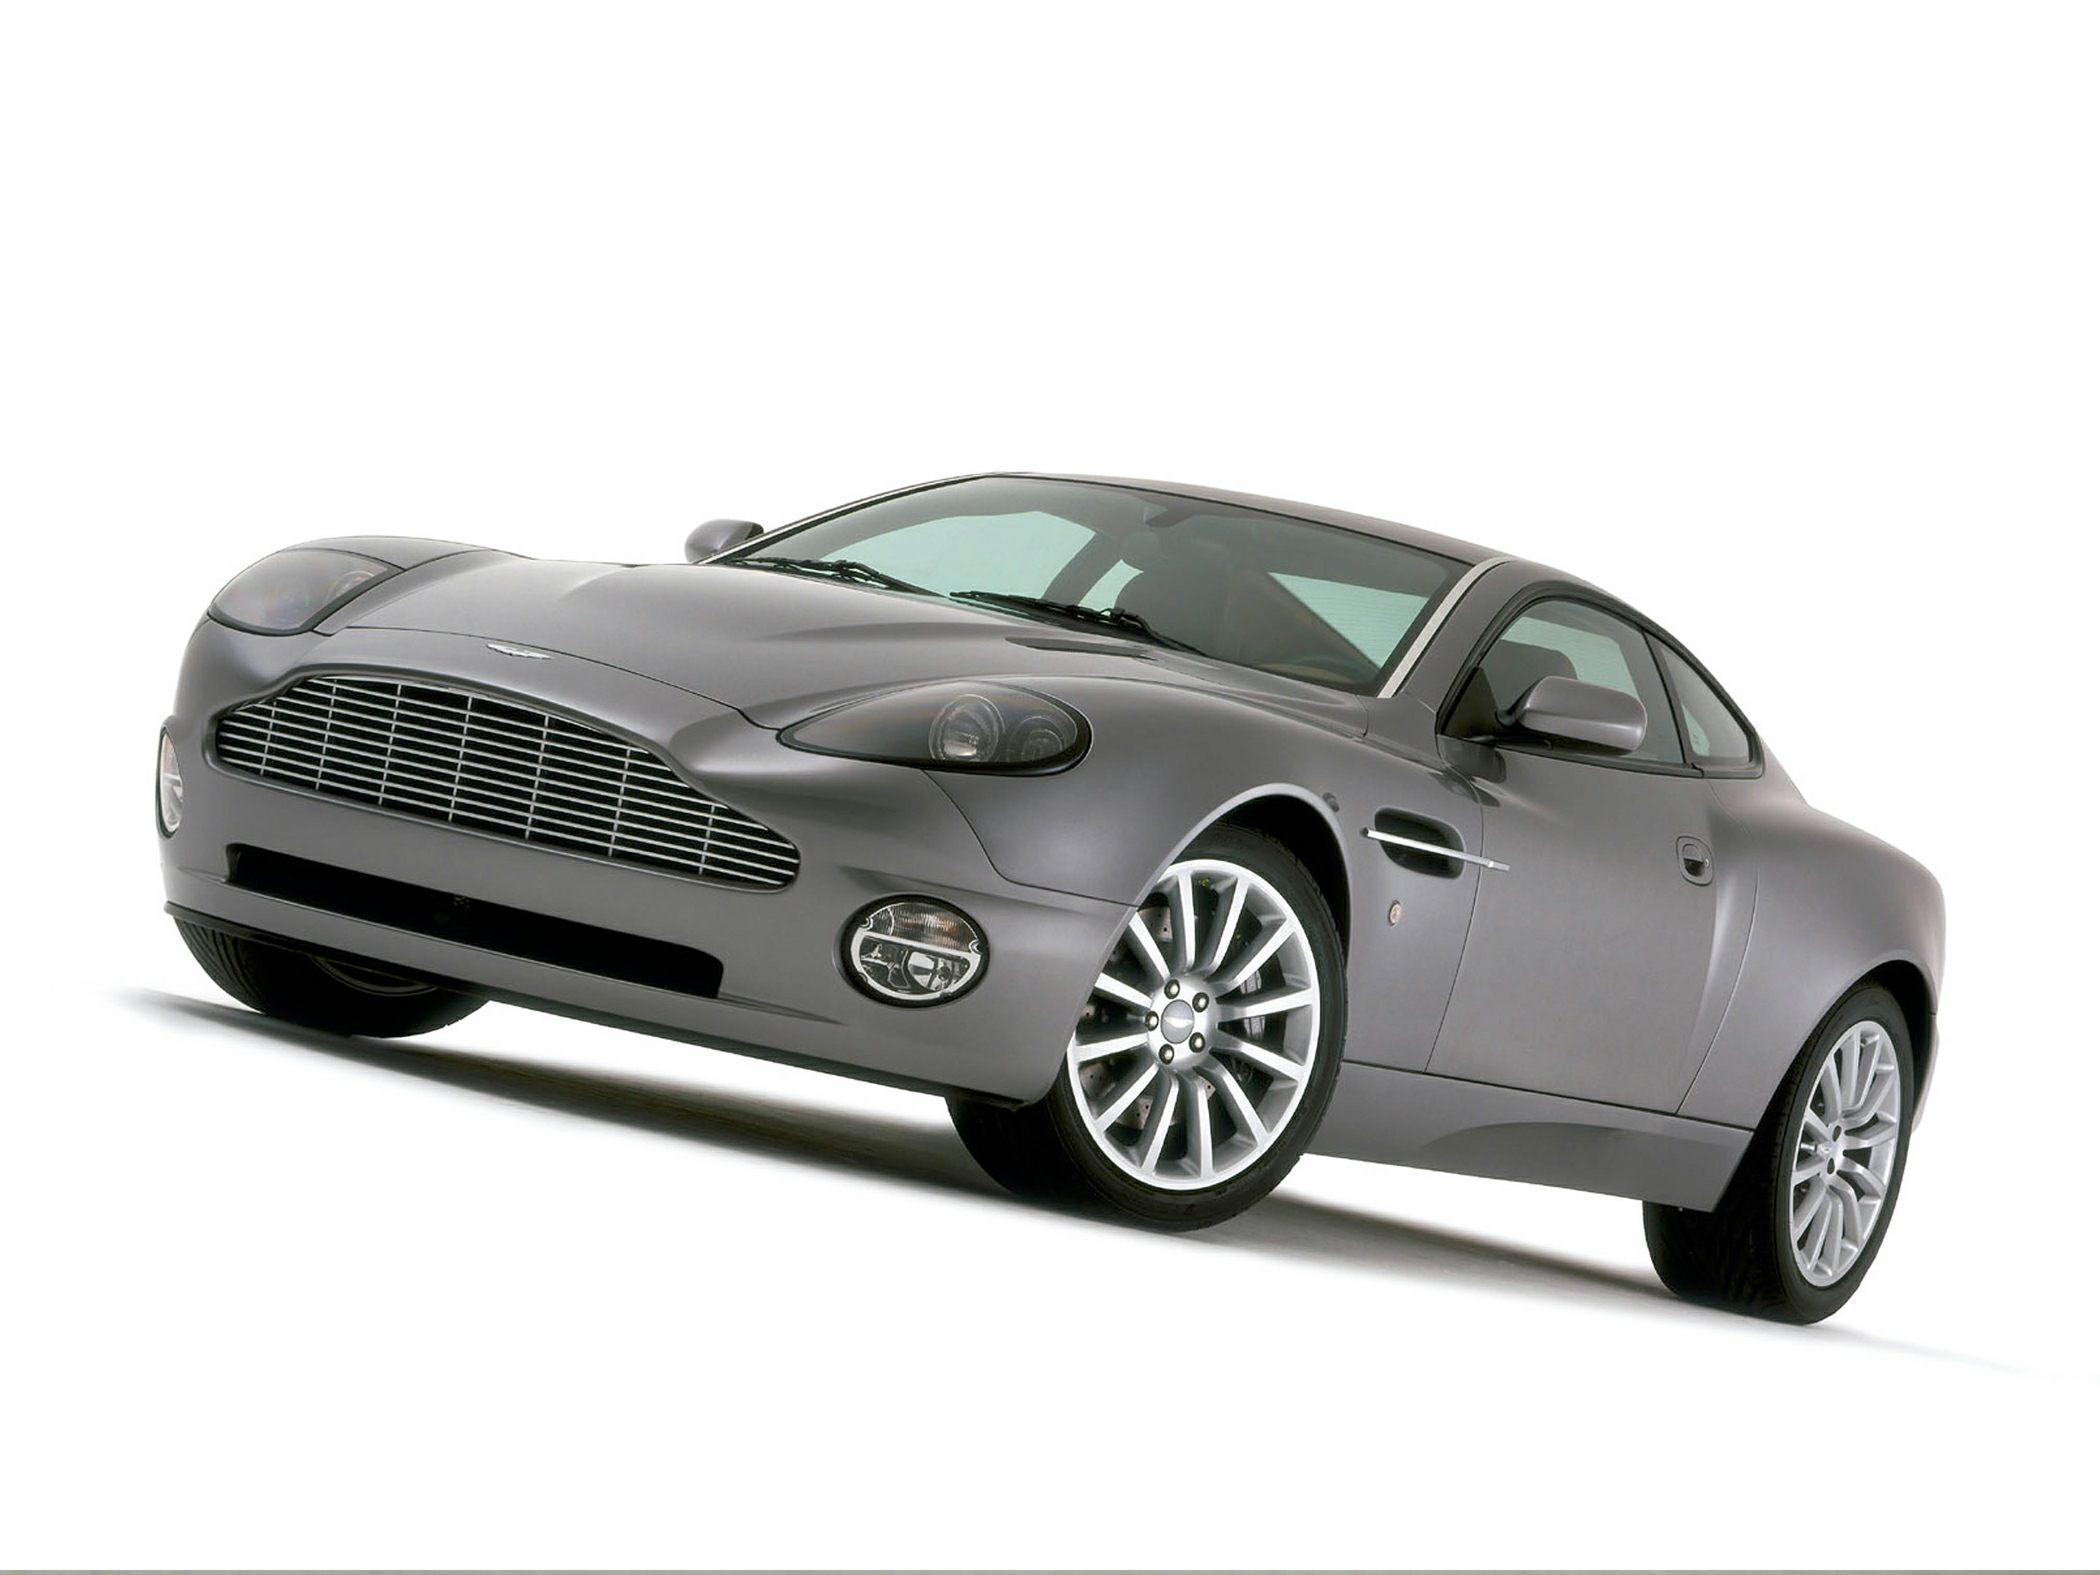 2005 Aston Martin Vanquish vs 2005 Ferrari 575M and 2005 Lamborghini